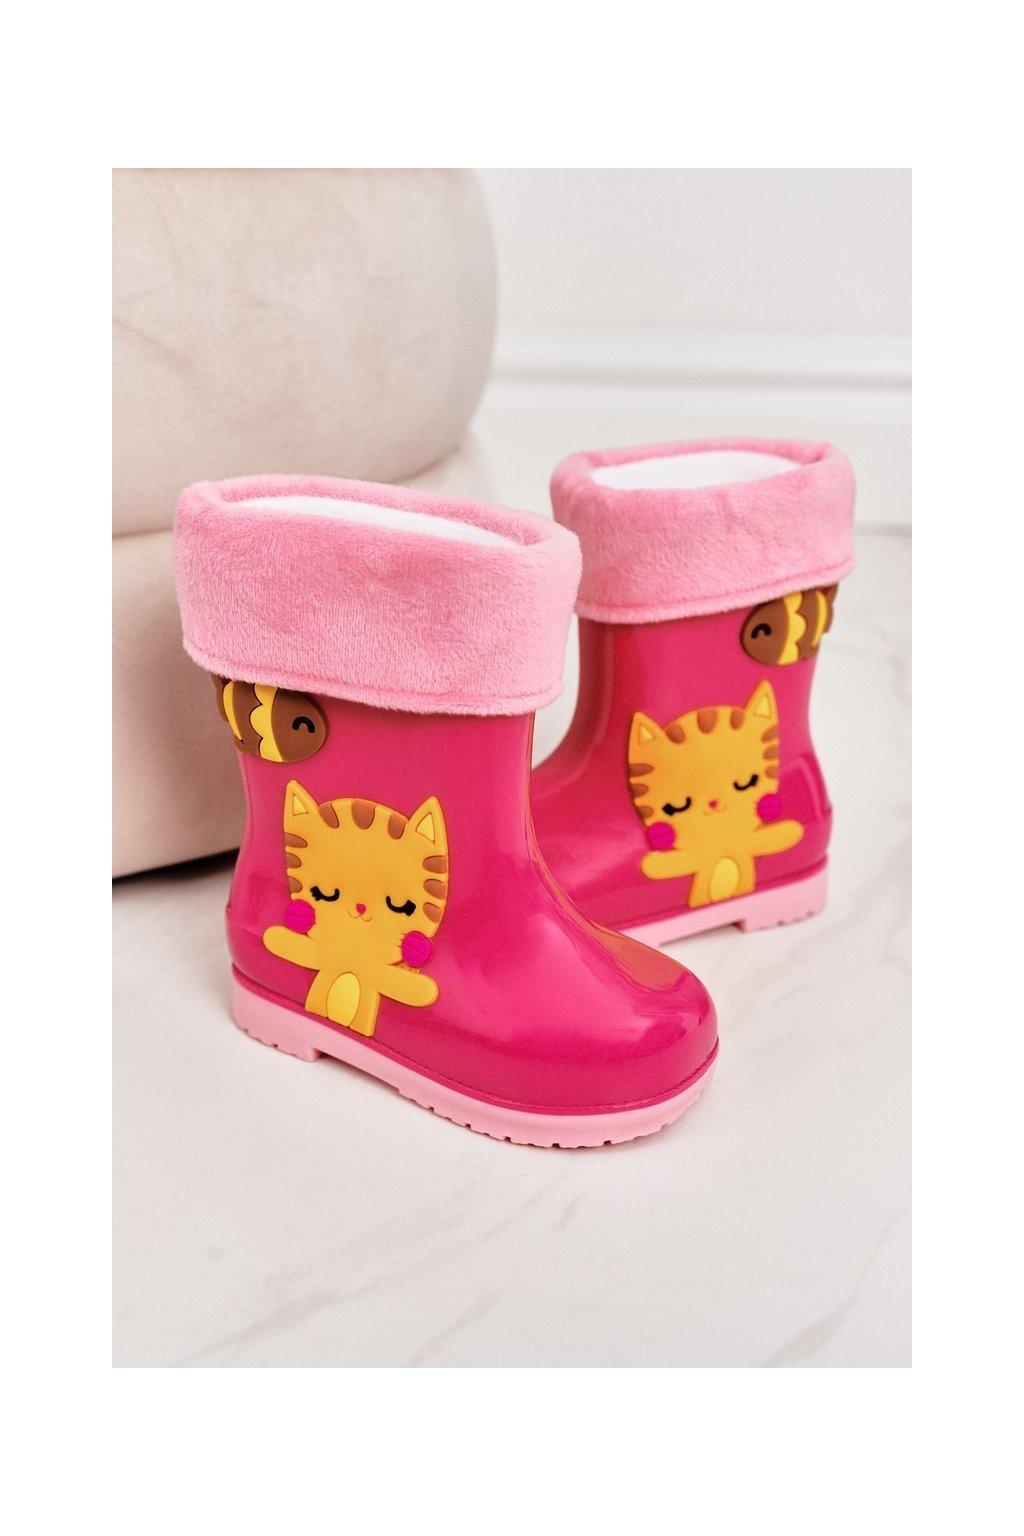 Ružová obuv kód topánok W094-2 PINK CAT